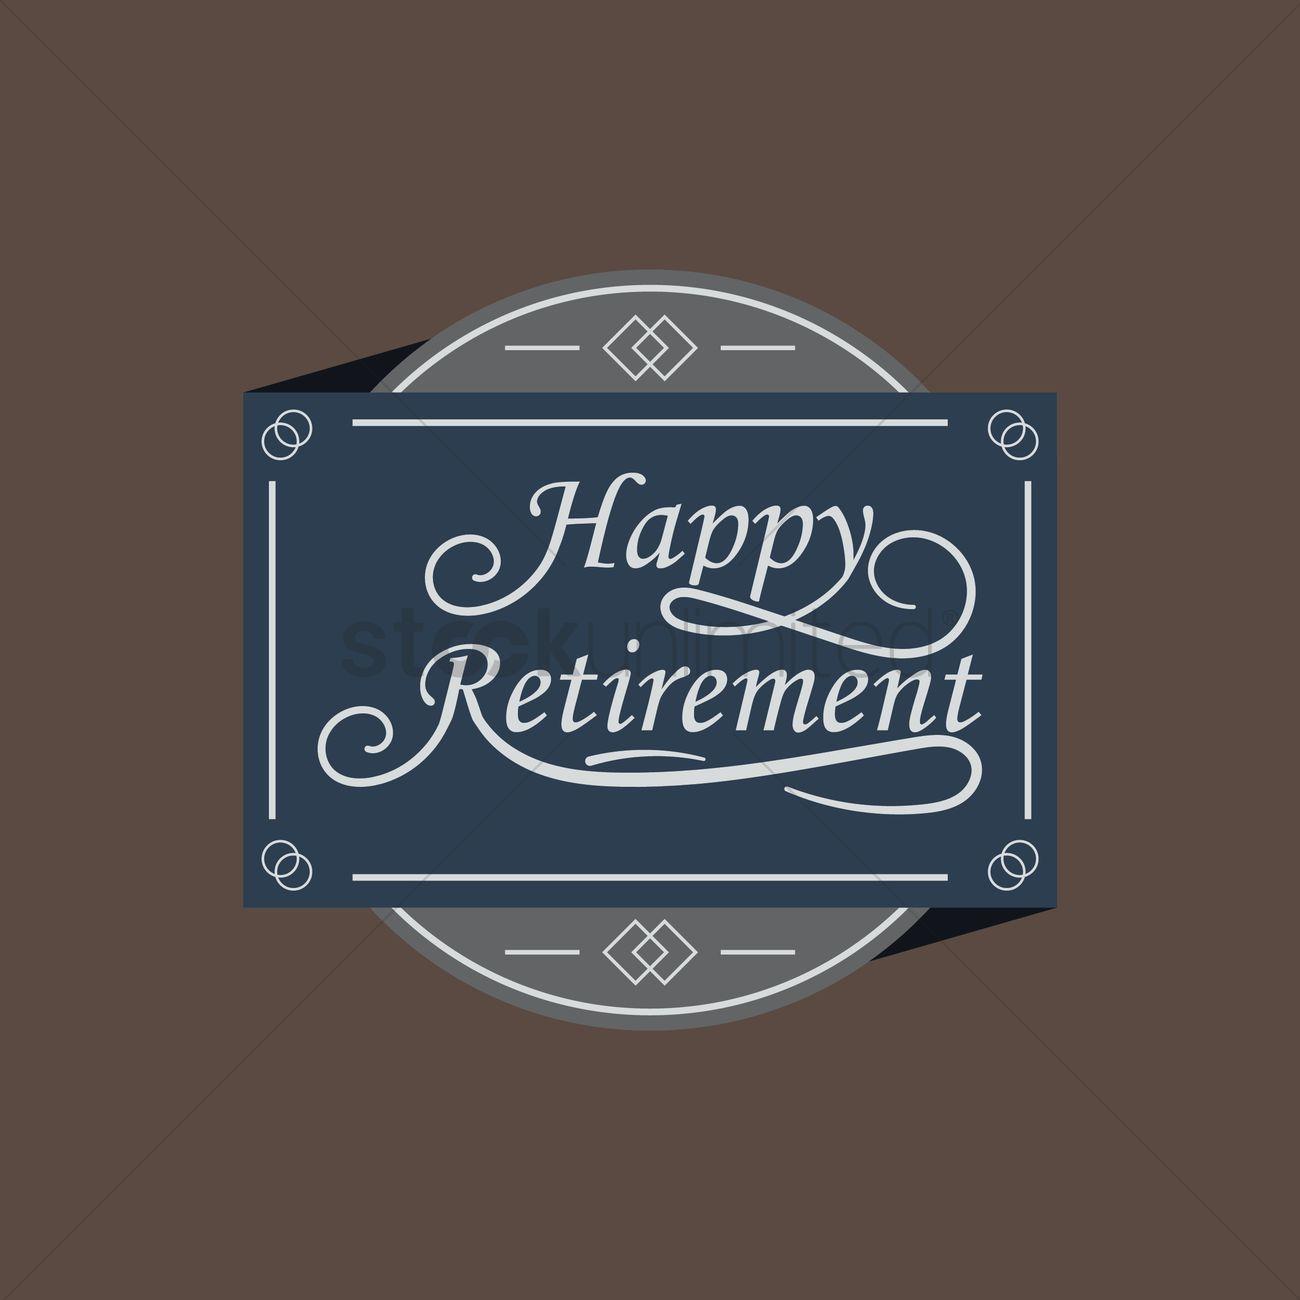 Happy Retirement Label Vector Image 1827490 Stockunlimited